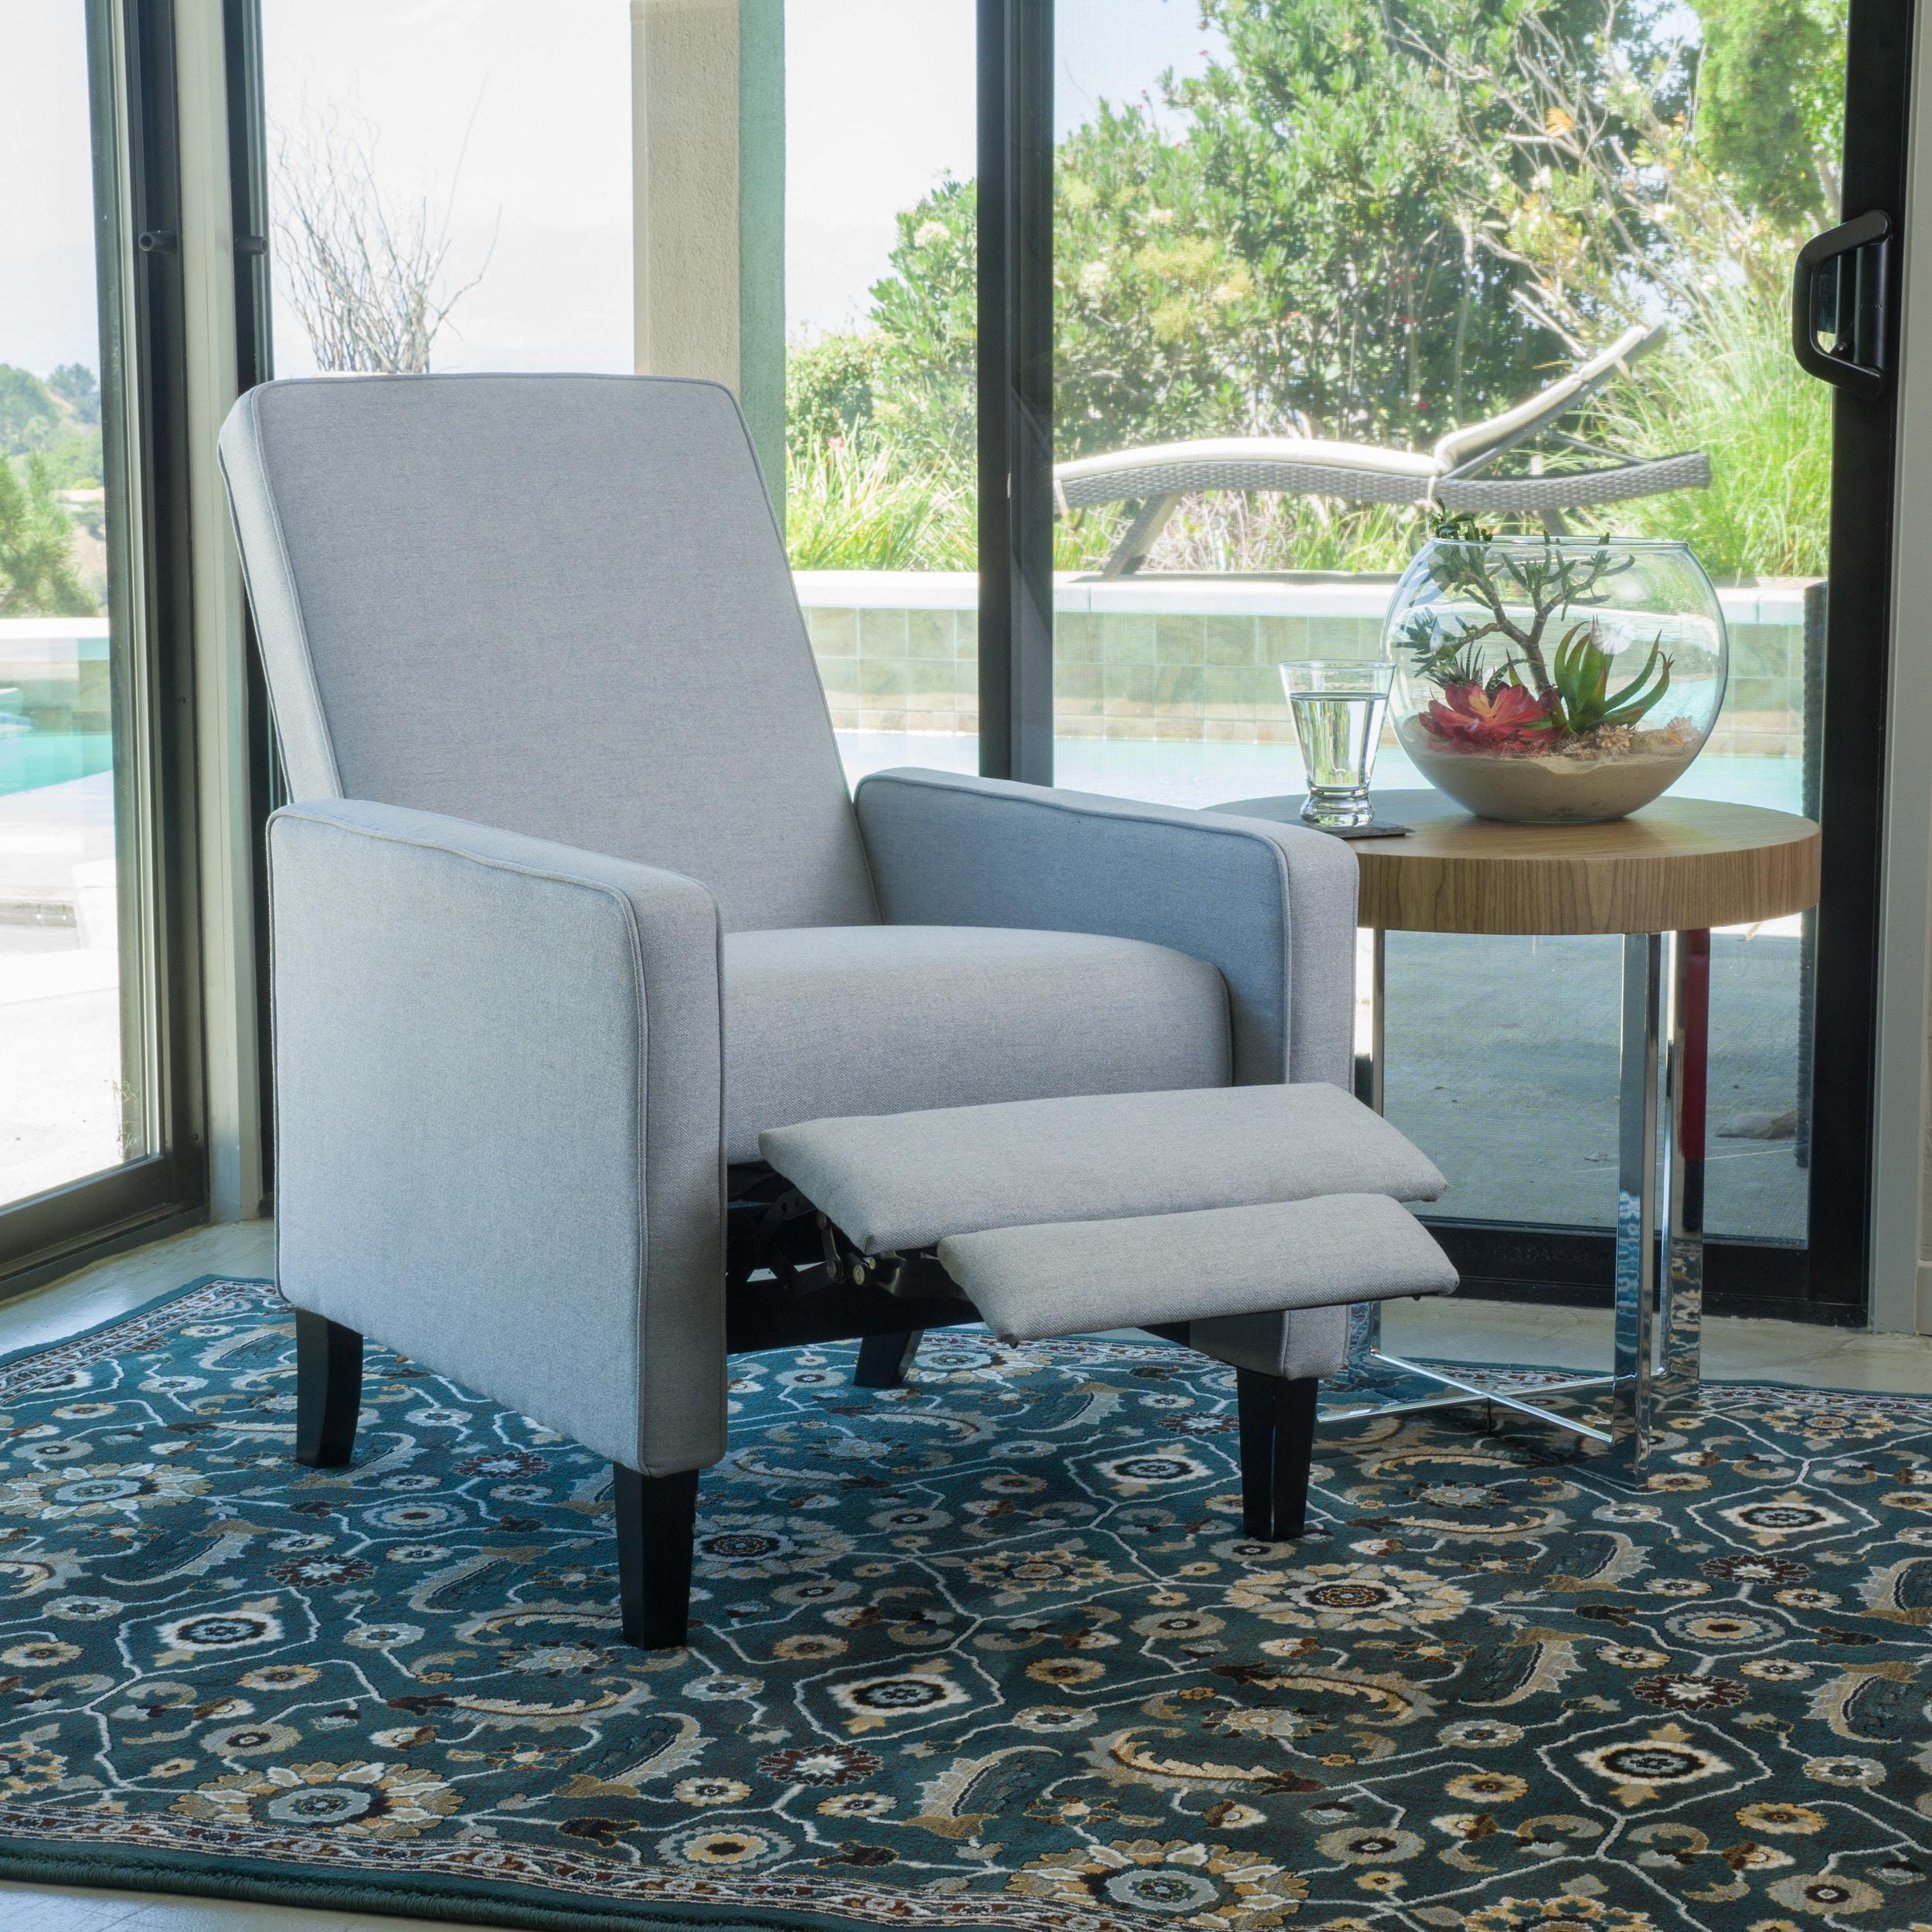 Enjoyable Dalton Fabric Recliner Club Chair By Christopher Knight Home Customarchery Wood Chair Design Ideas Customarcherynet